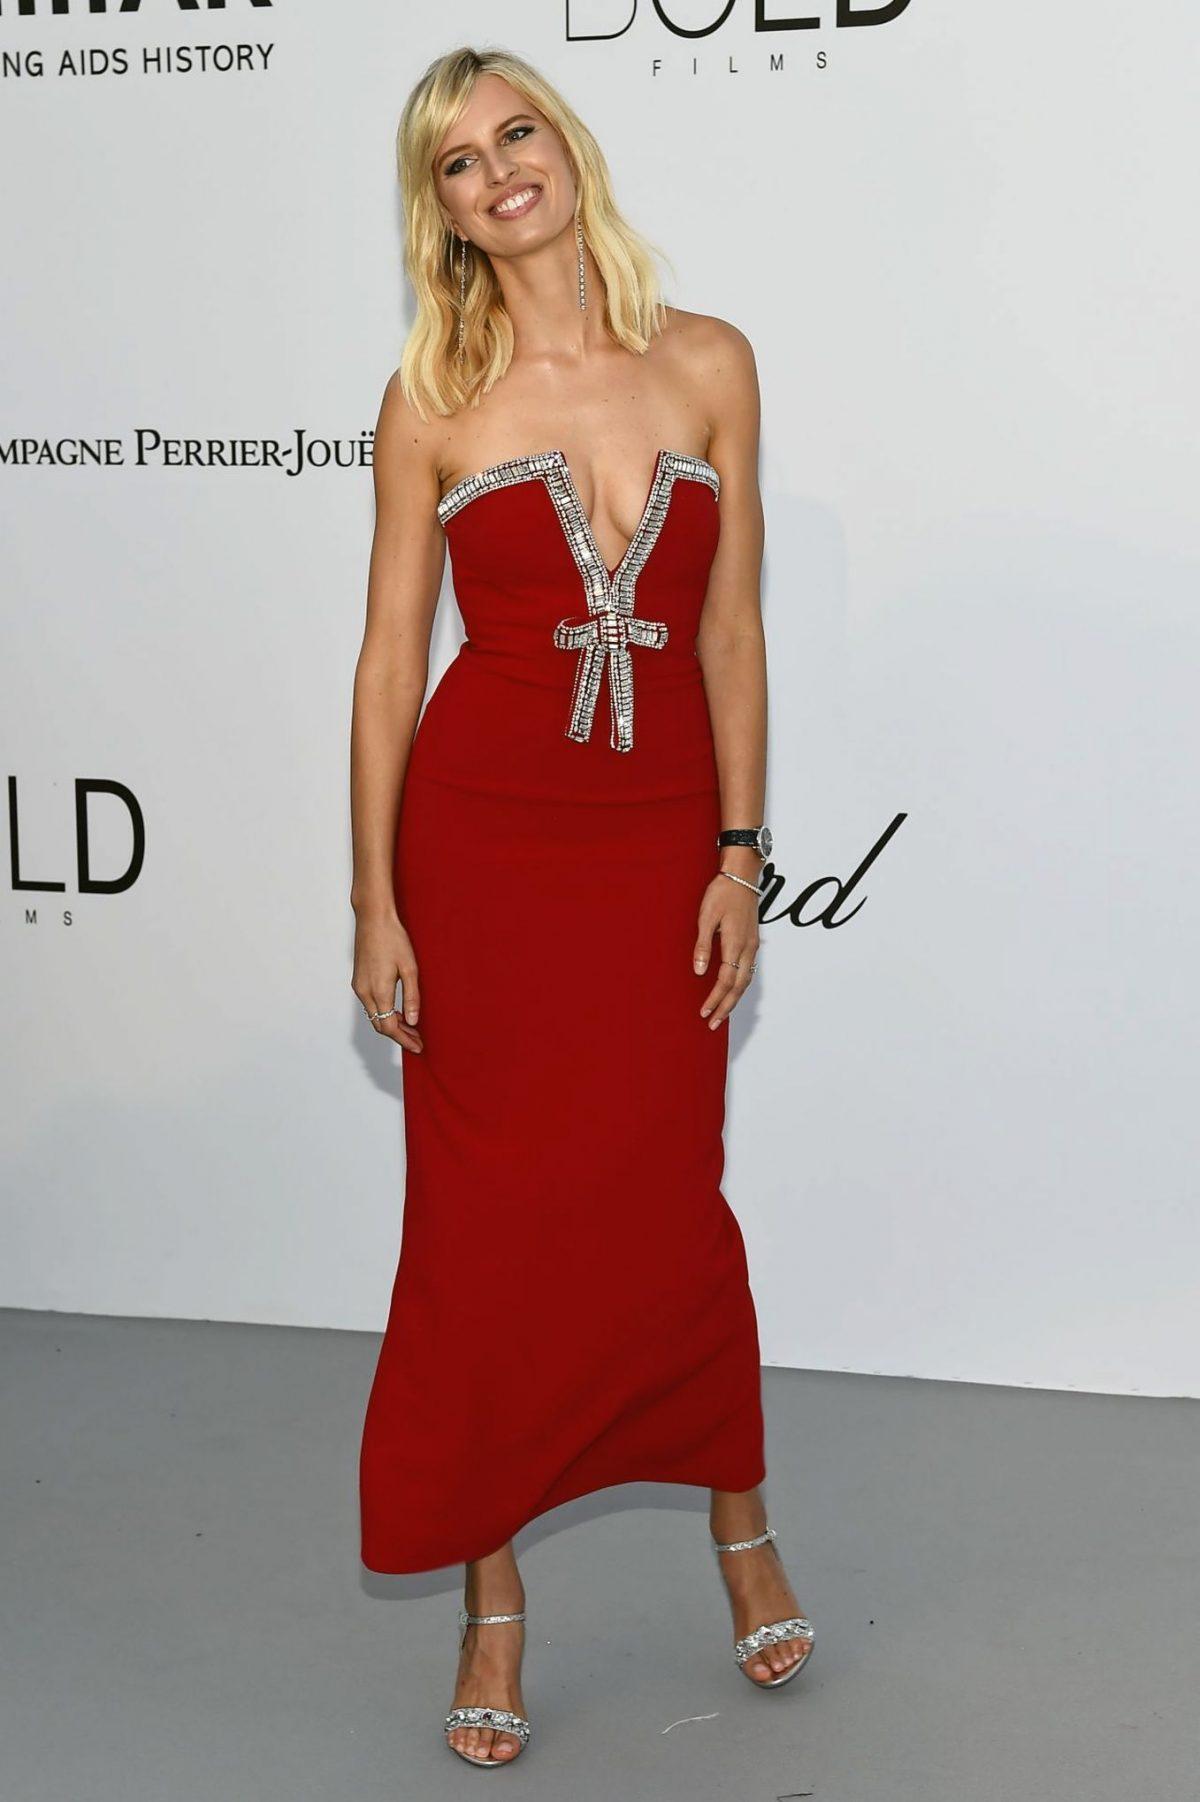 karolina kurkova boobs